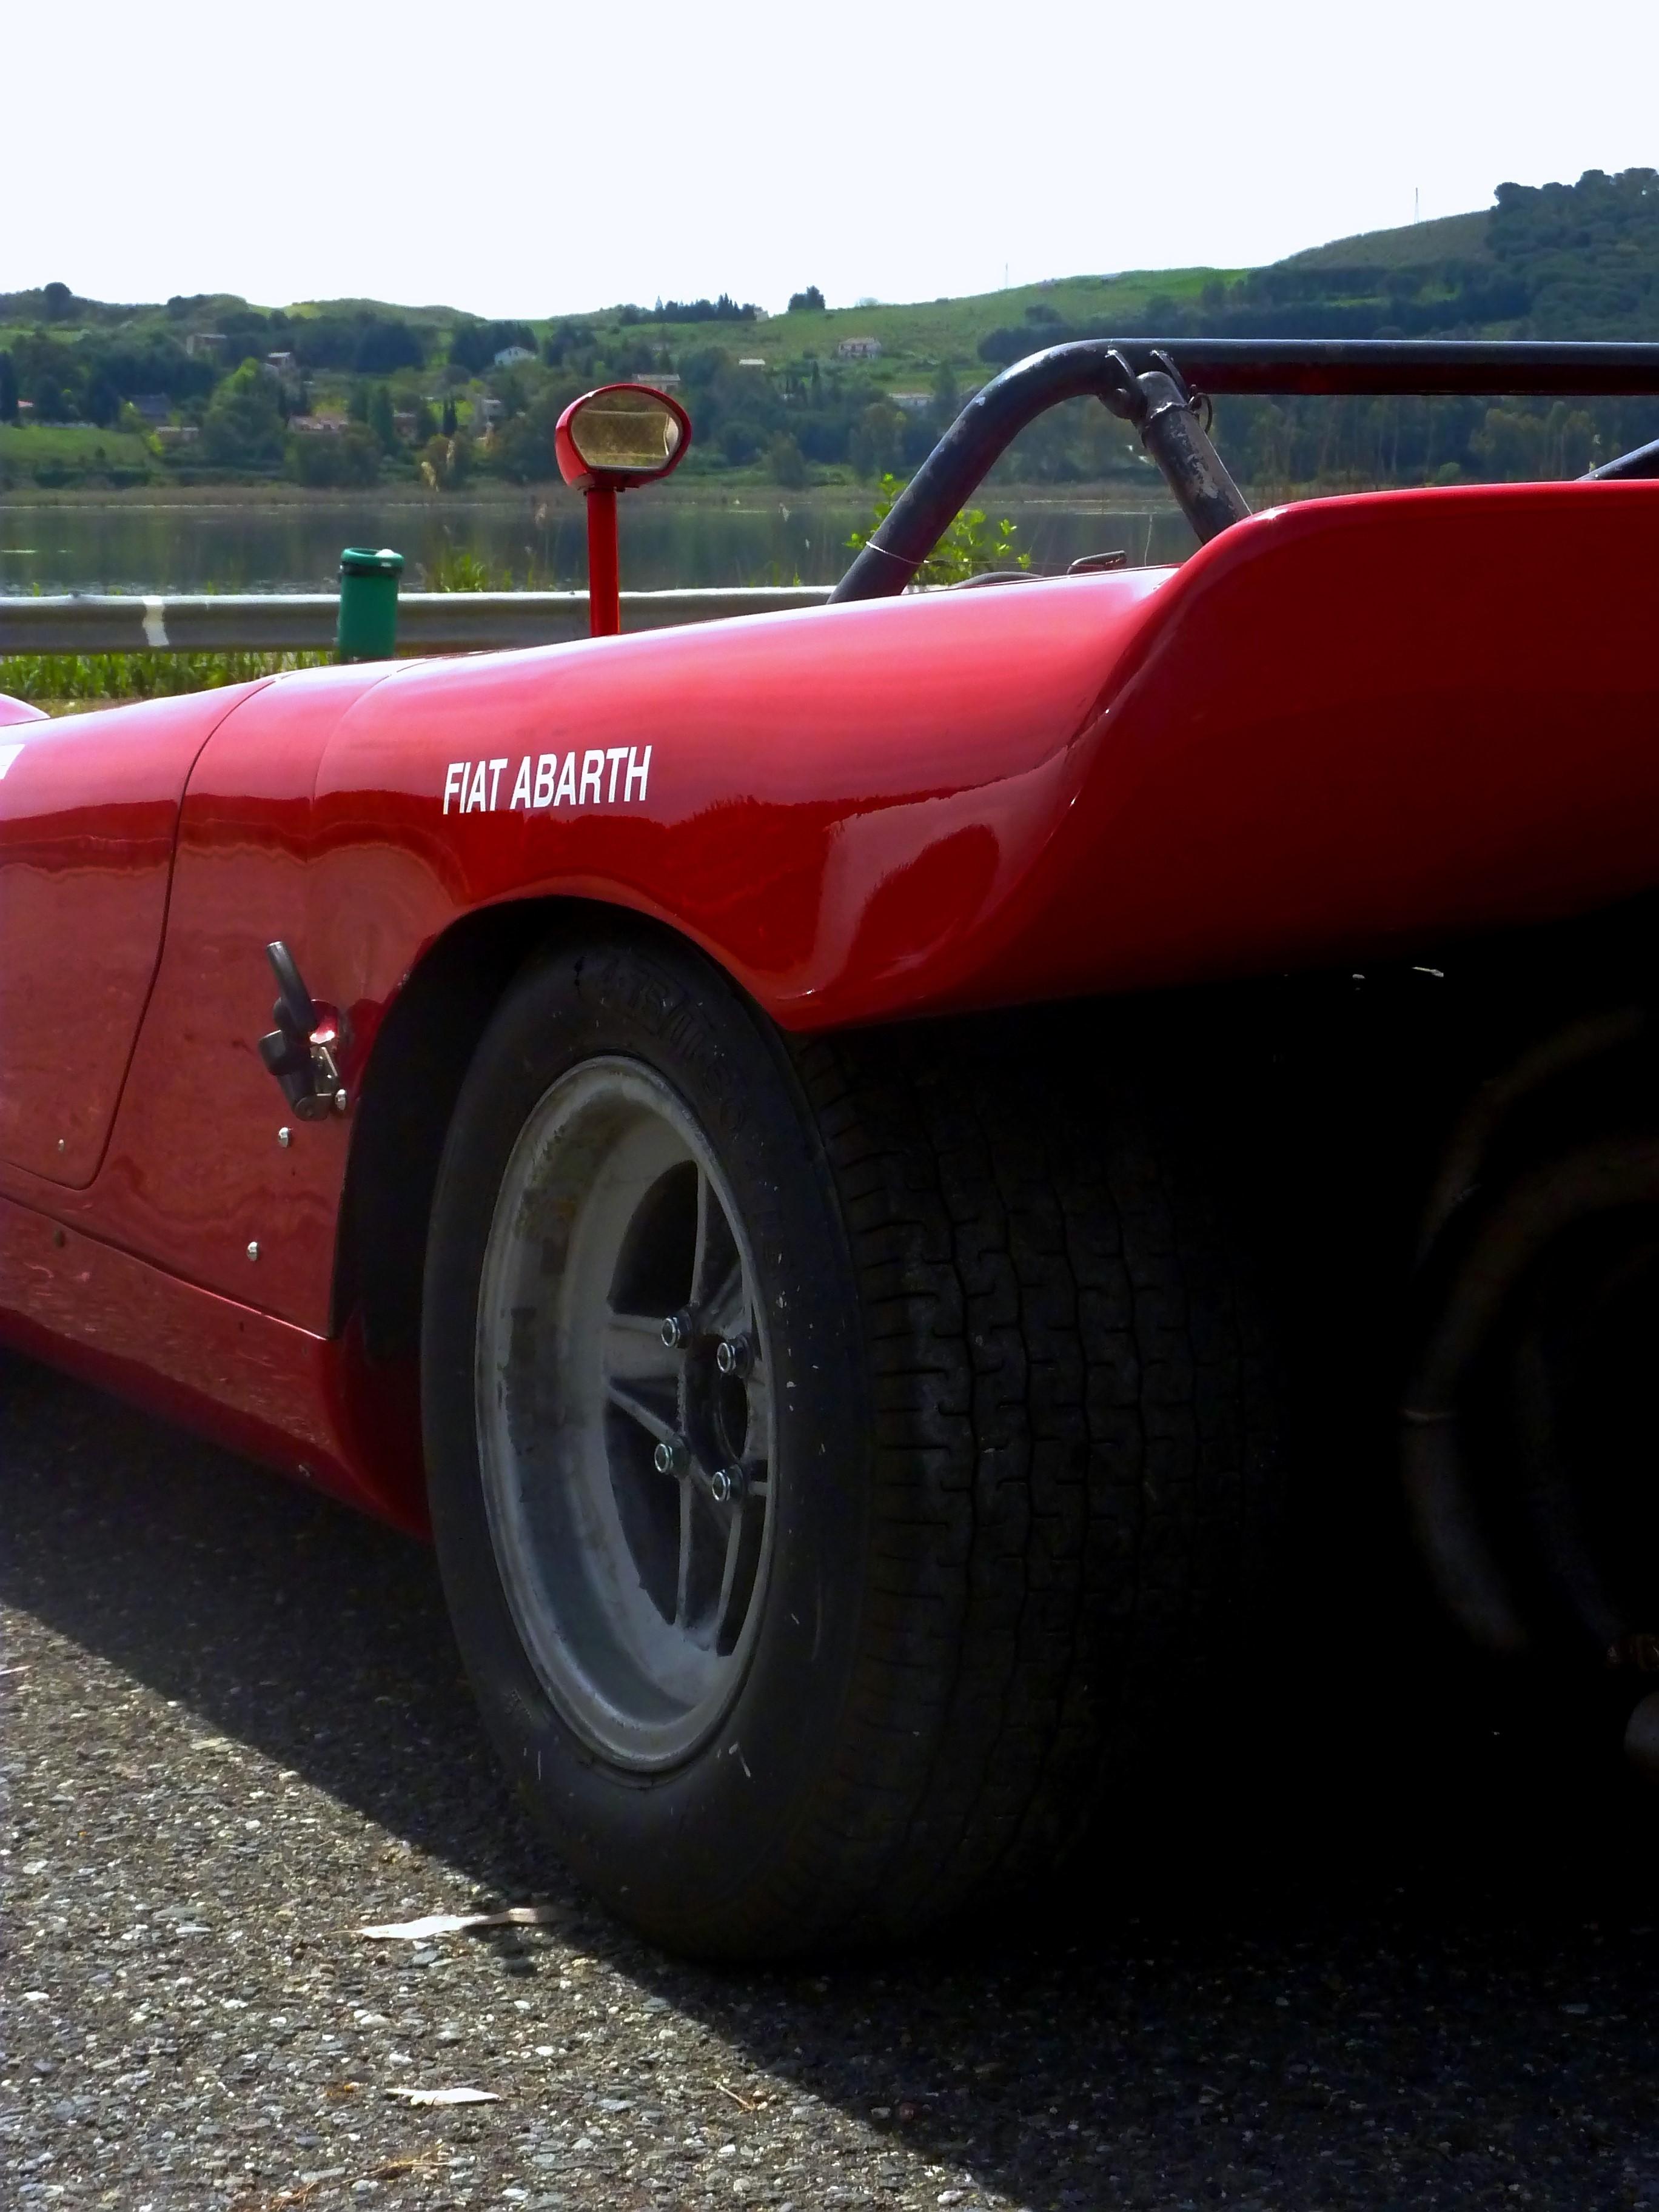 1971 Abarth 1300 SE 018 Biposto Cuneo (19)